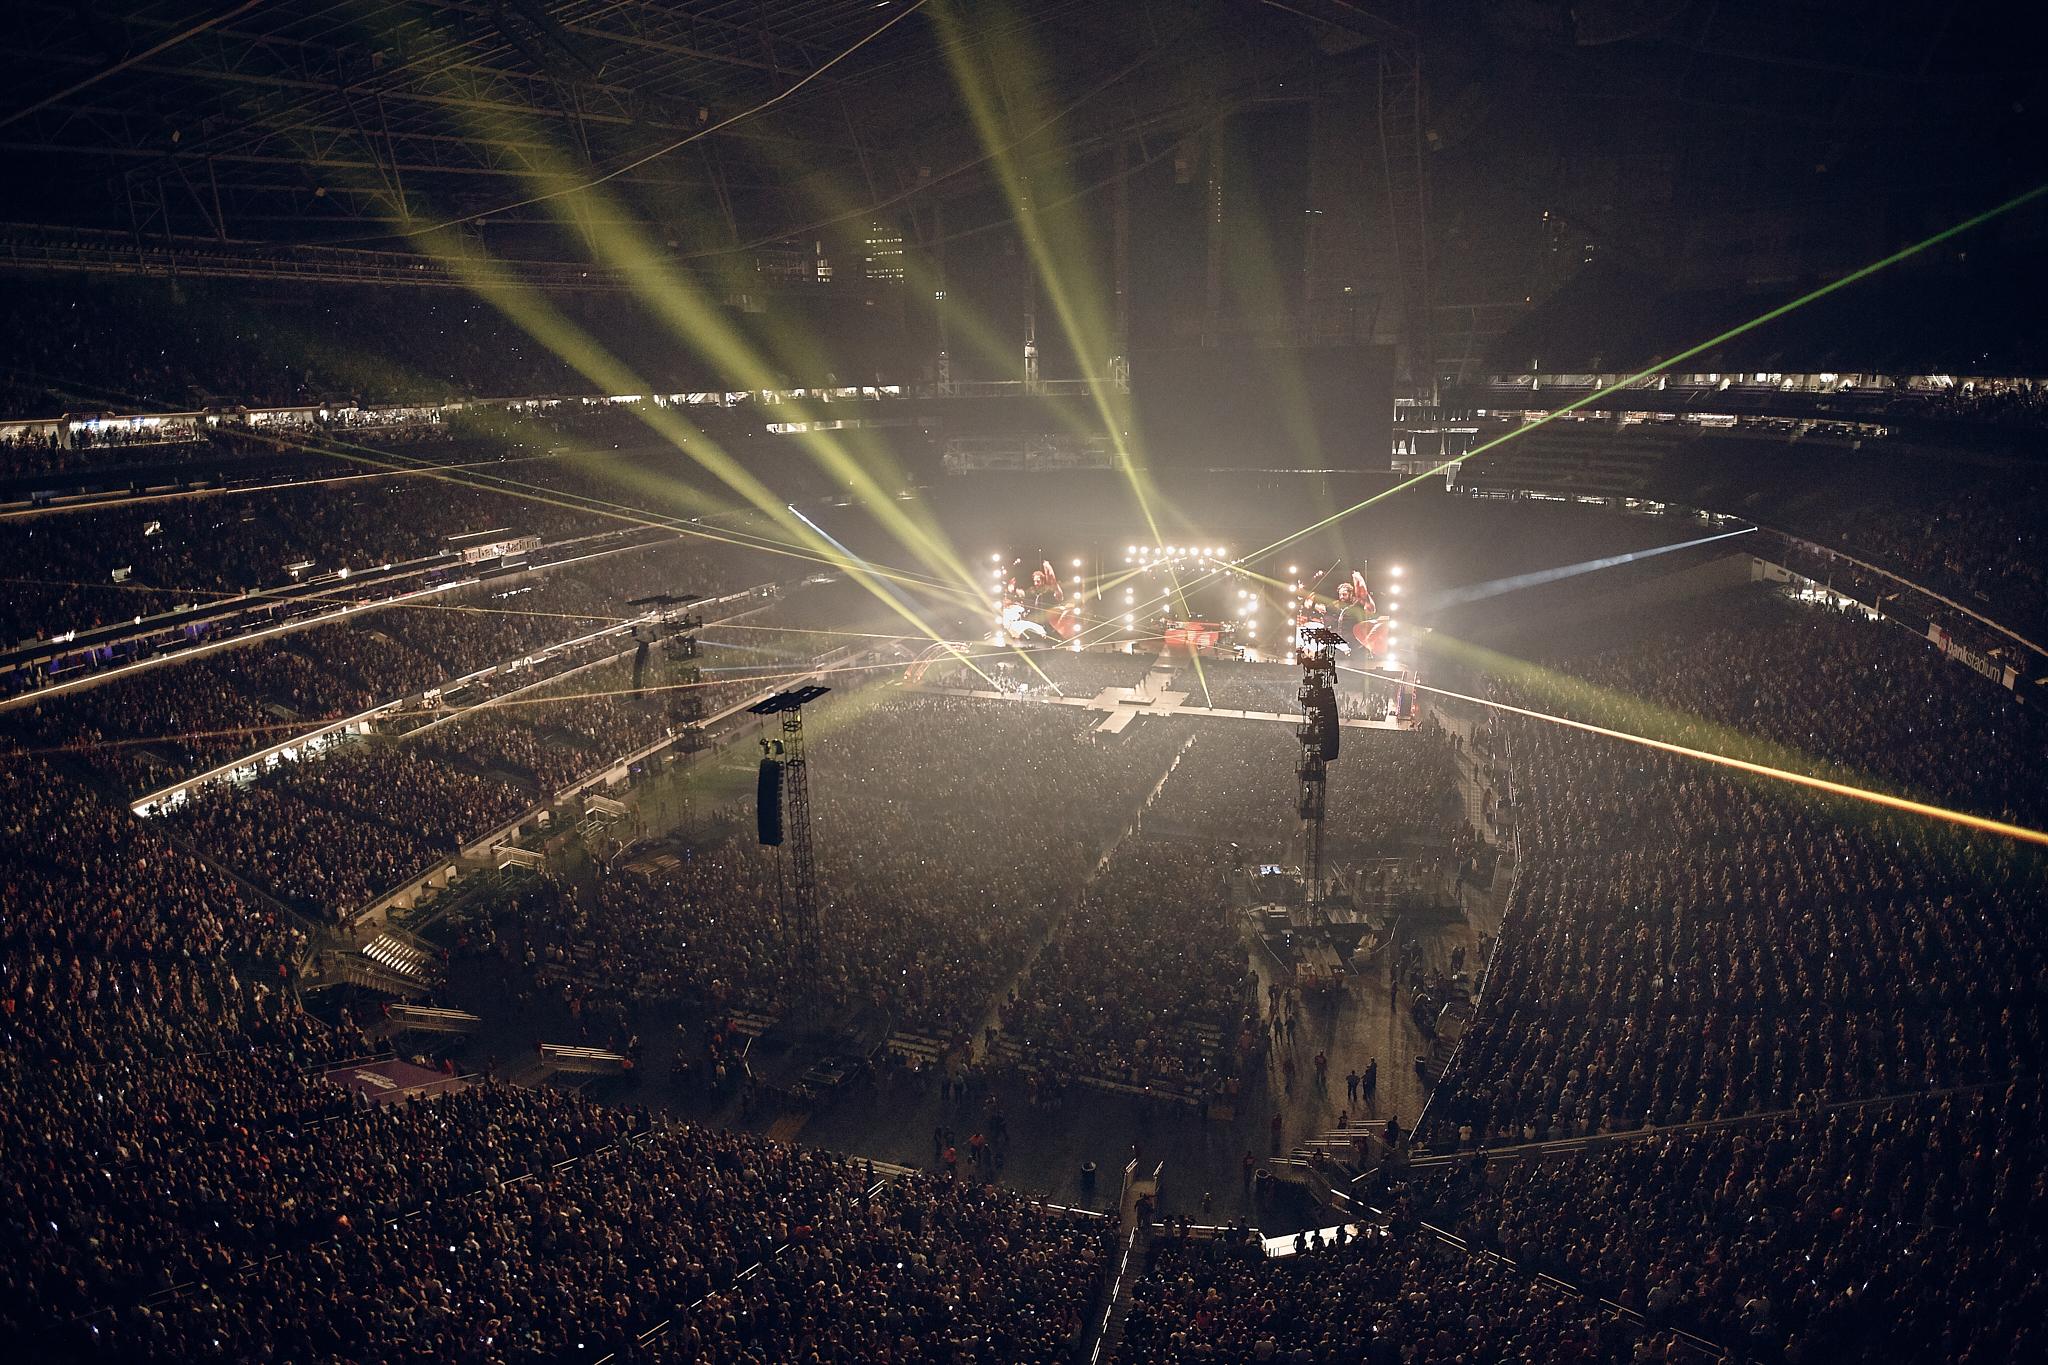 First_Concert_Luke_Bryan_US_Bank_Stadium_Minneapolis_Minnesota_Photography_By_Joe_Lemke_014.JPG